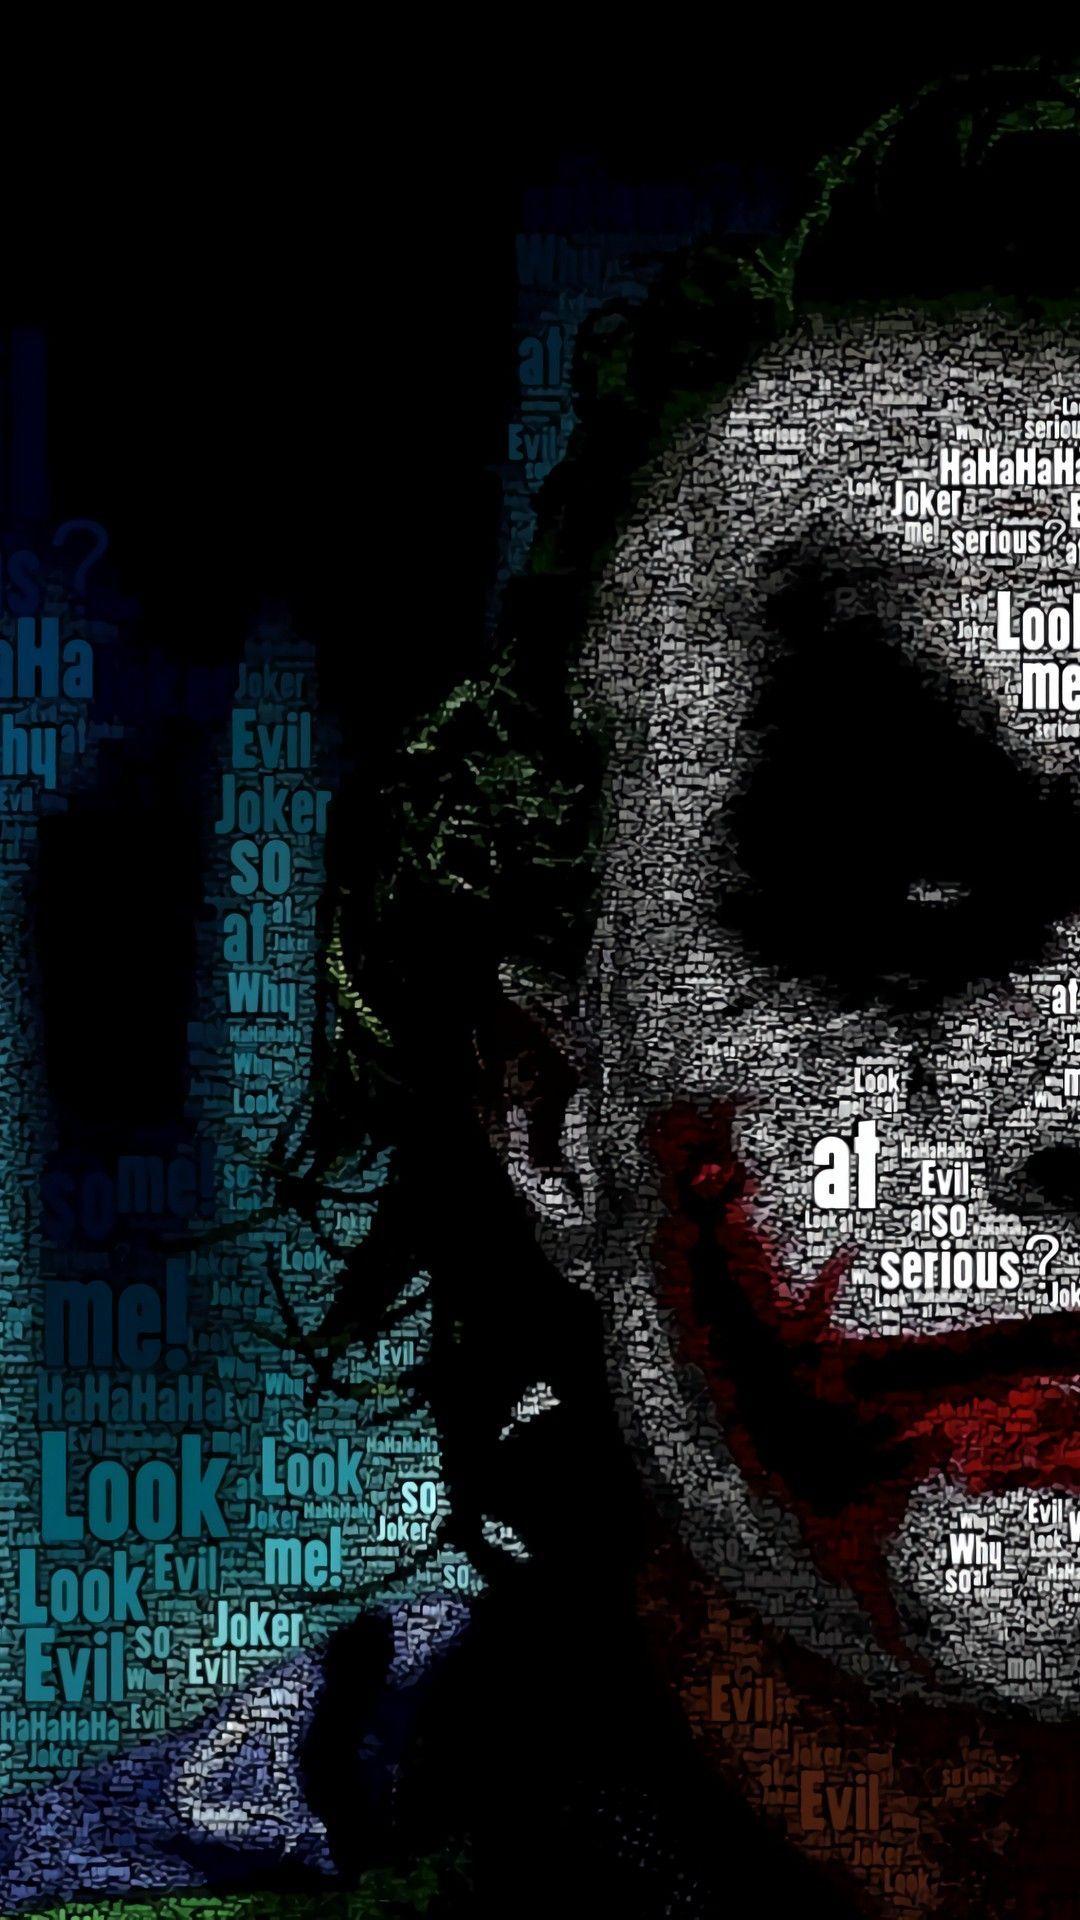 2020 Wallpapers Best Wallpapers Collection Iphone Wallpapers Backgrounds Joker Aesthetic Wallpaper Cool Wallpaper Joker Wallpaper